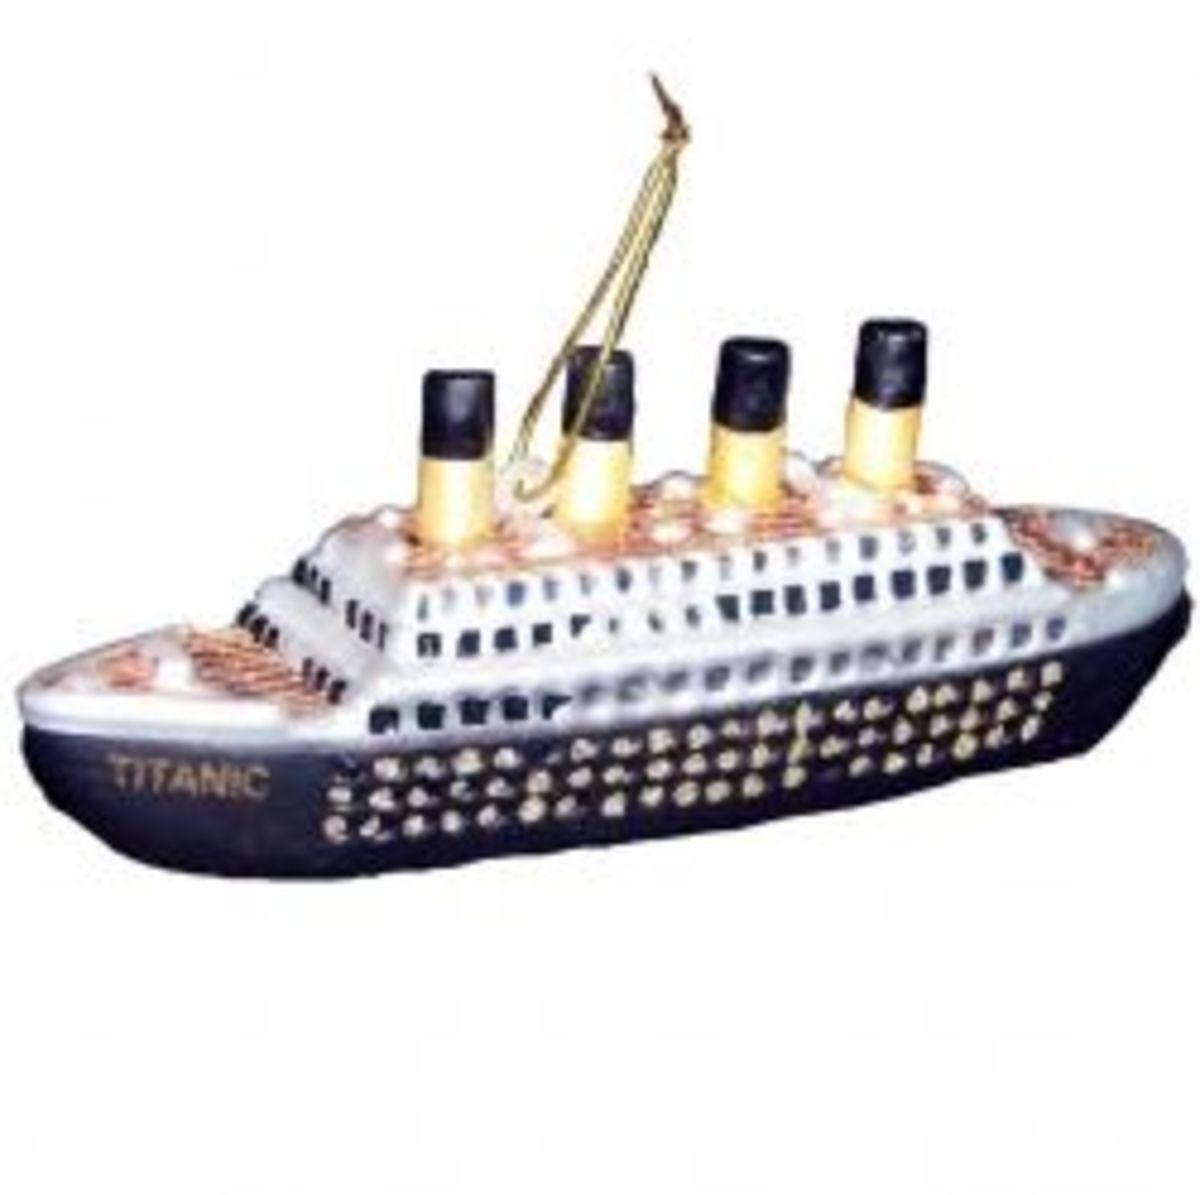 Practical Cruise Gift Ideas